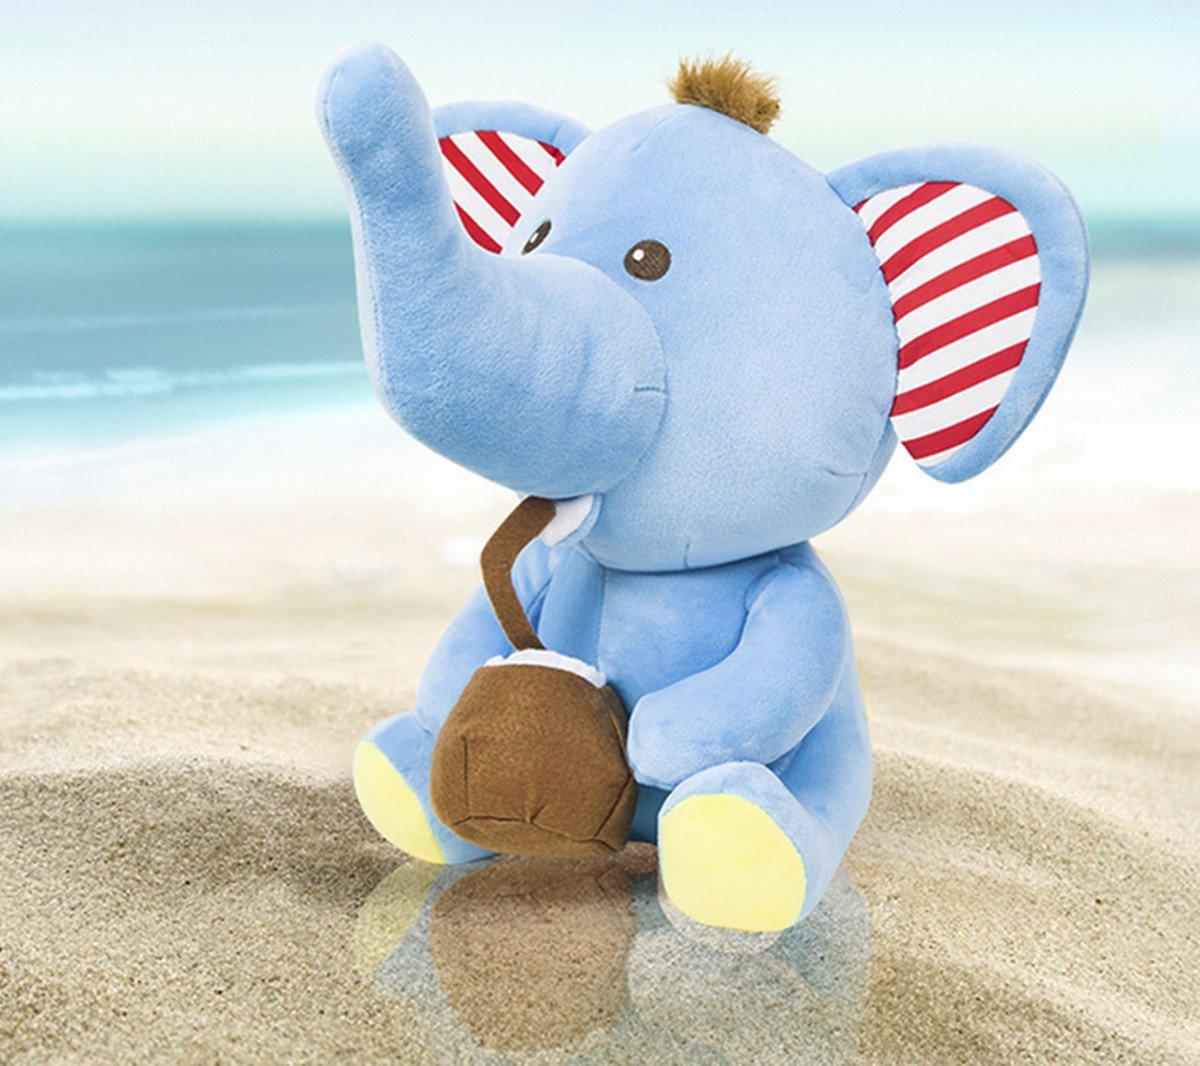 Amazon.com: Rainbow Fox Cute Cotton Hawaii Elephant Animal Stuffed Plush Toys (33cm x 30cm, Hawaii Elephant): Home & Kitchen